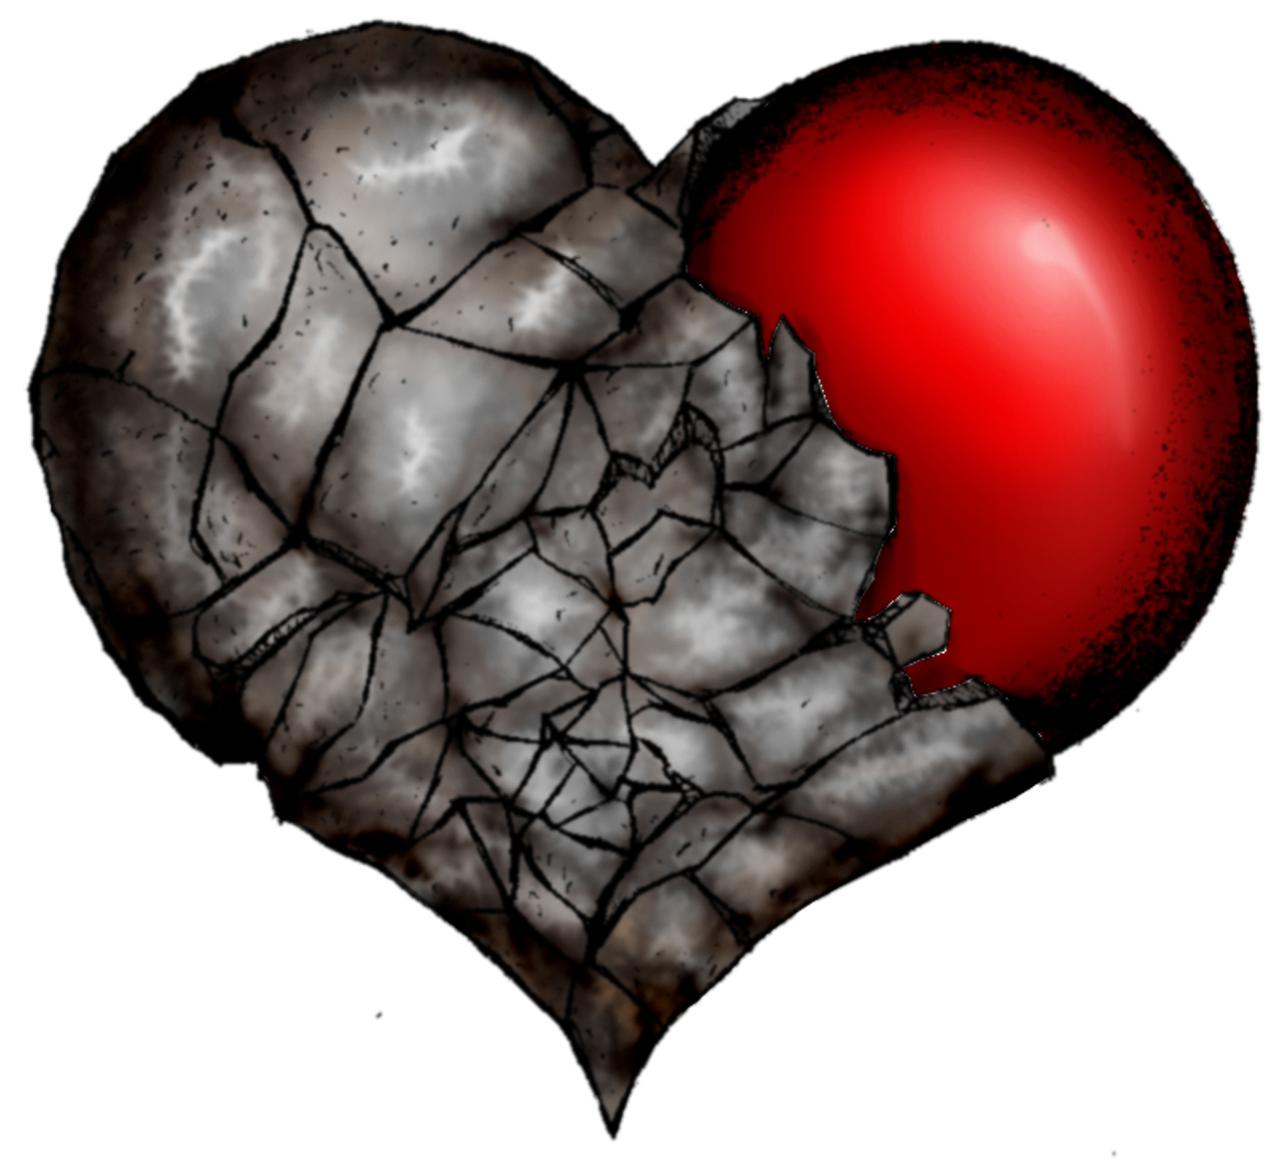 Heart_of_Stone_by_TheComicFan.jpg